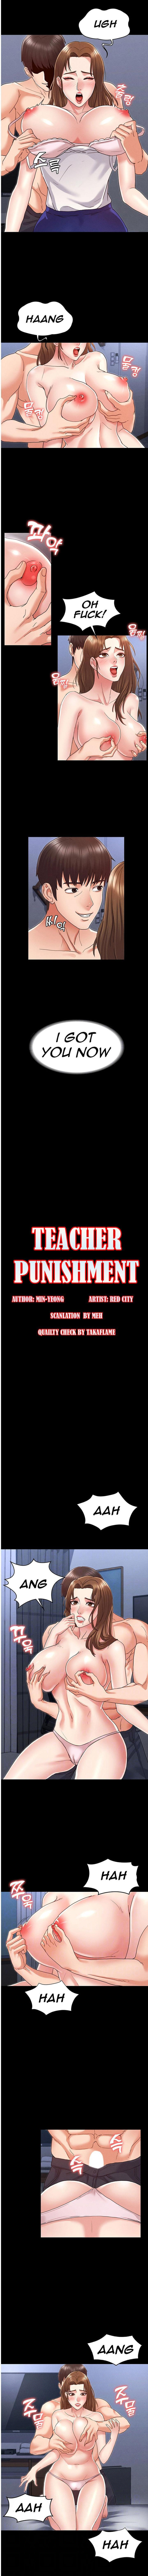 TEACHER PUNISHMENT Ch.1-20 19